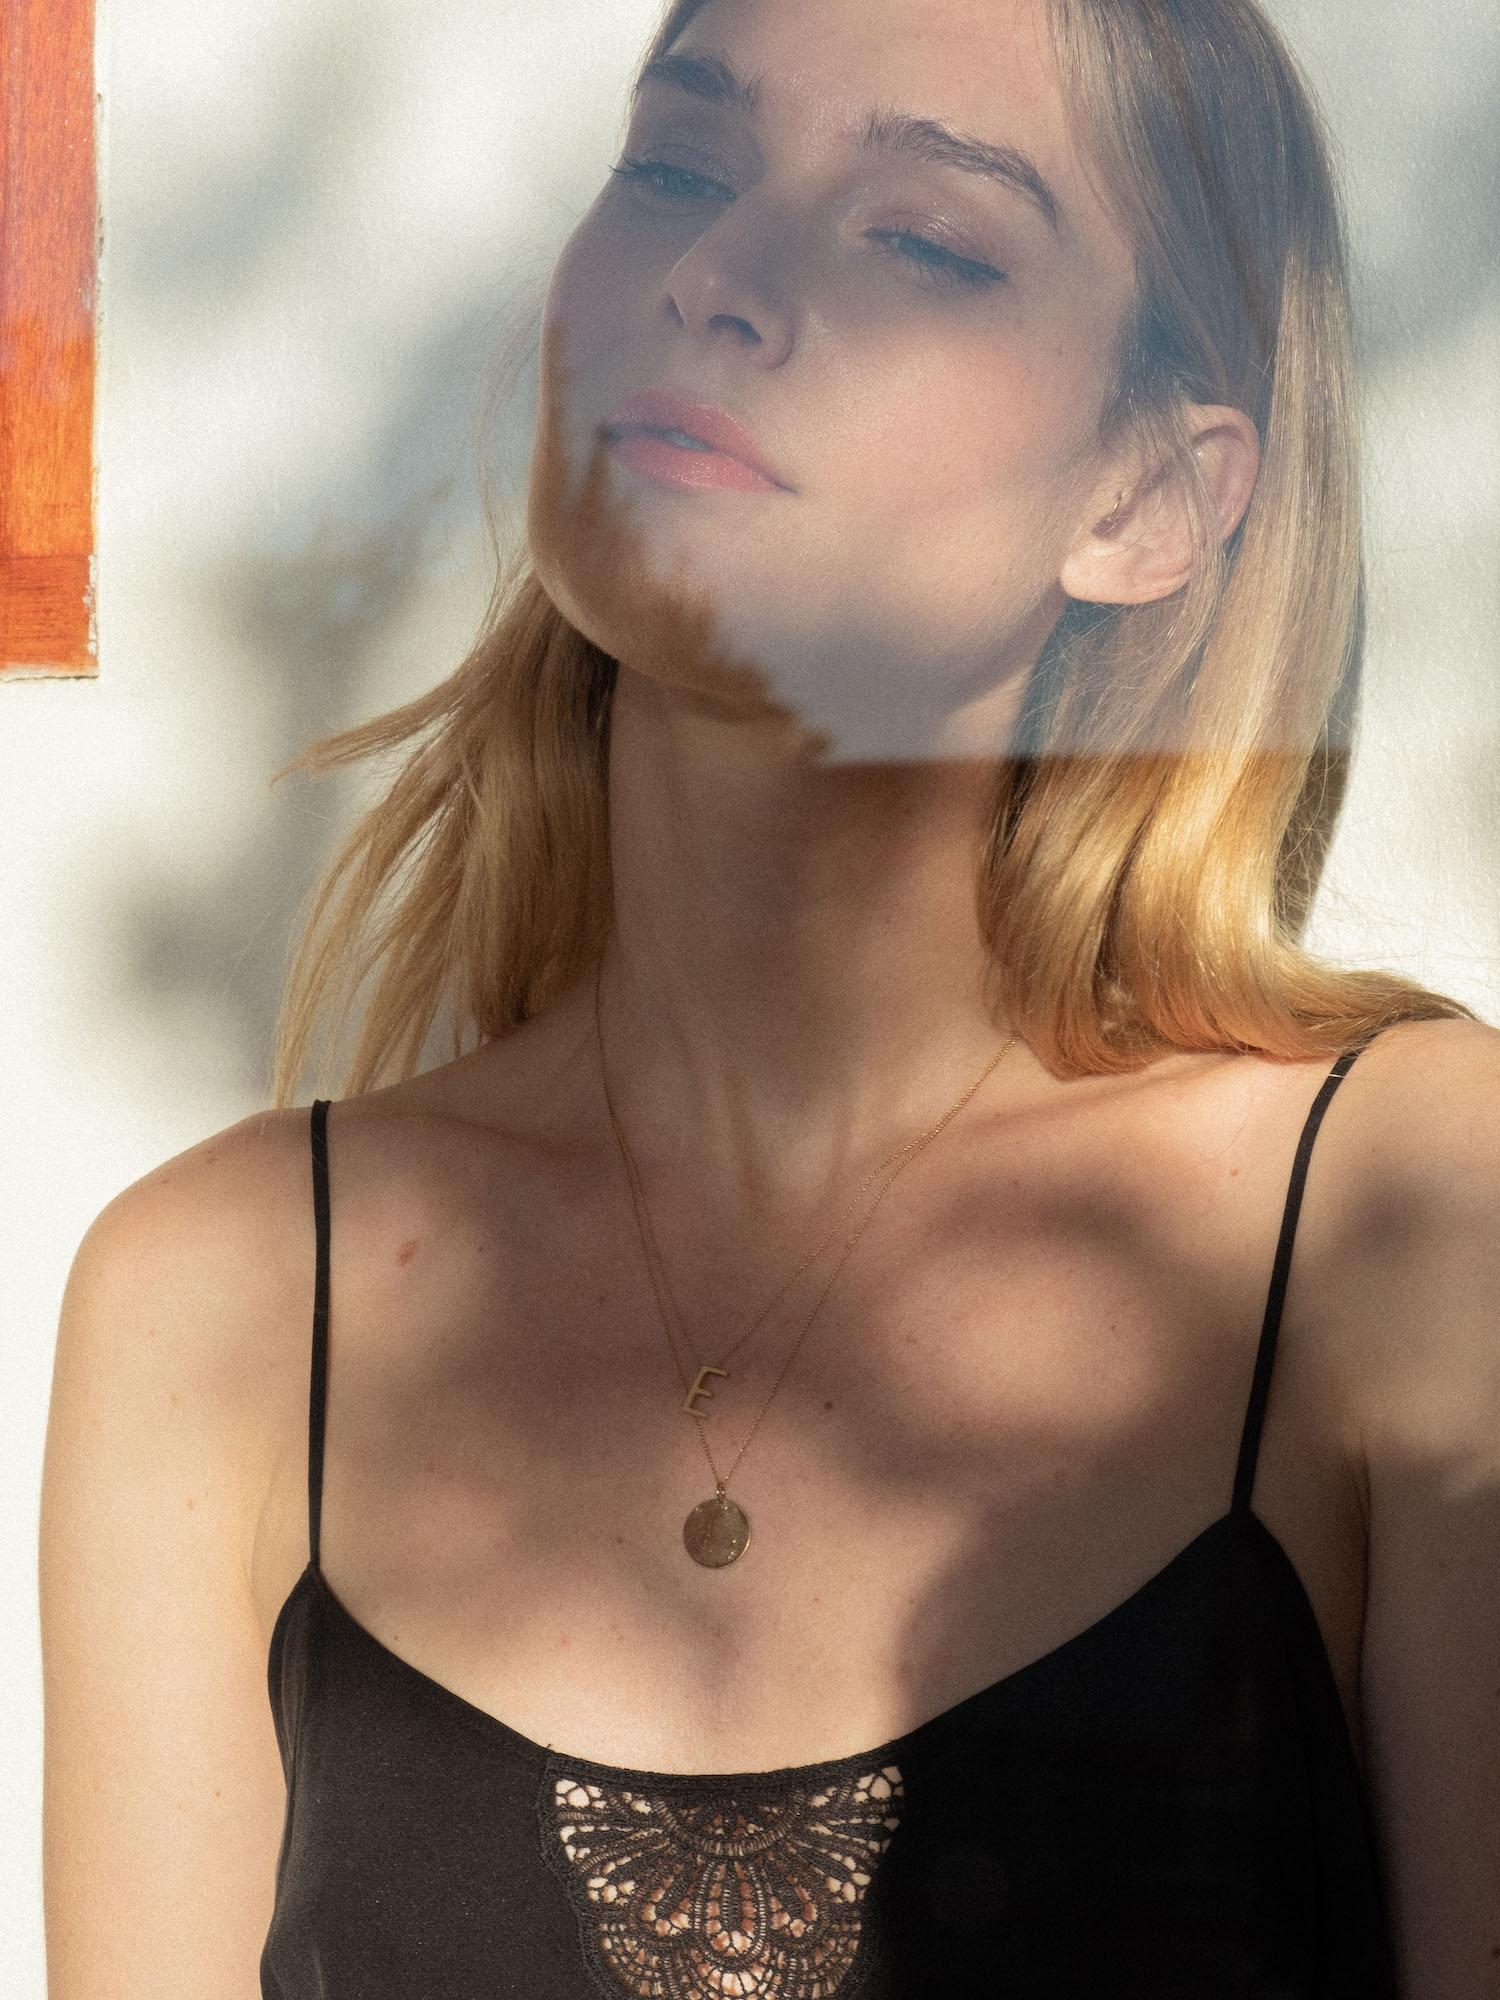 Beautyblog Bare Minds Lippenstifte für helle Haut 1